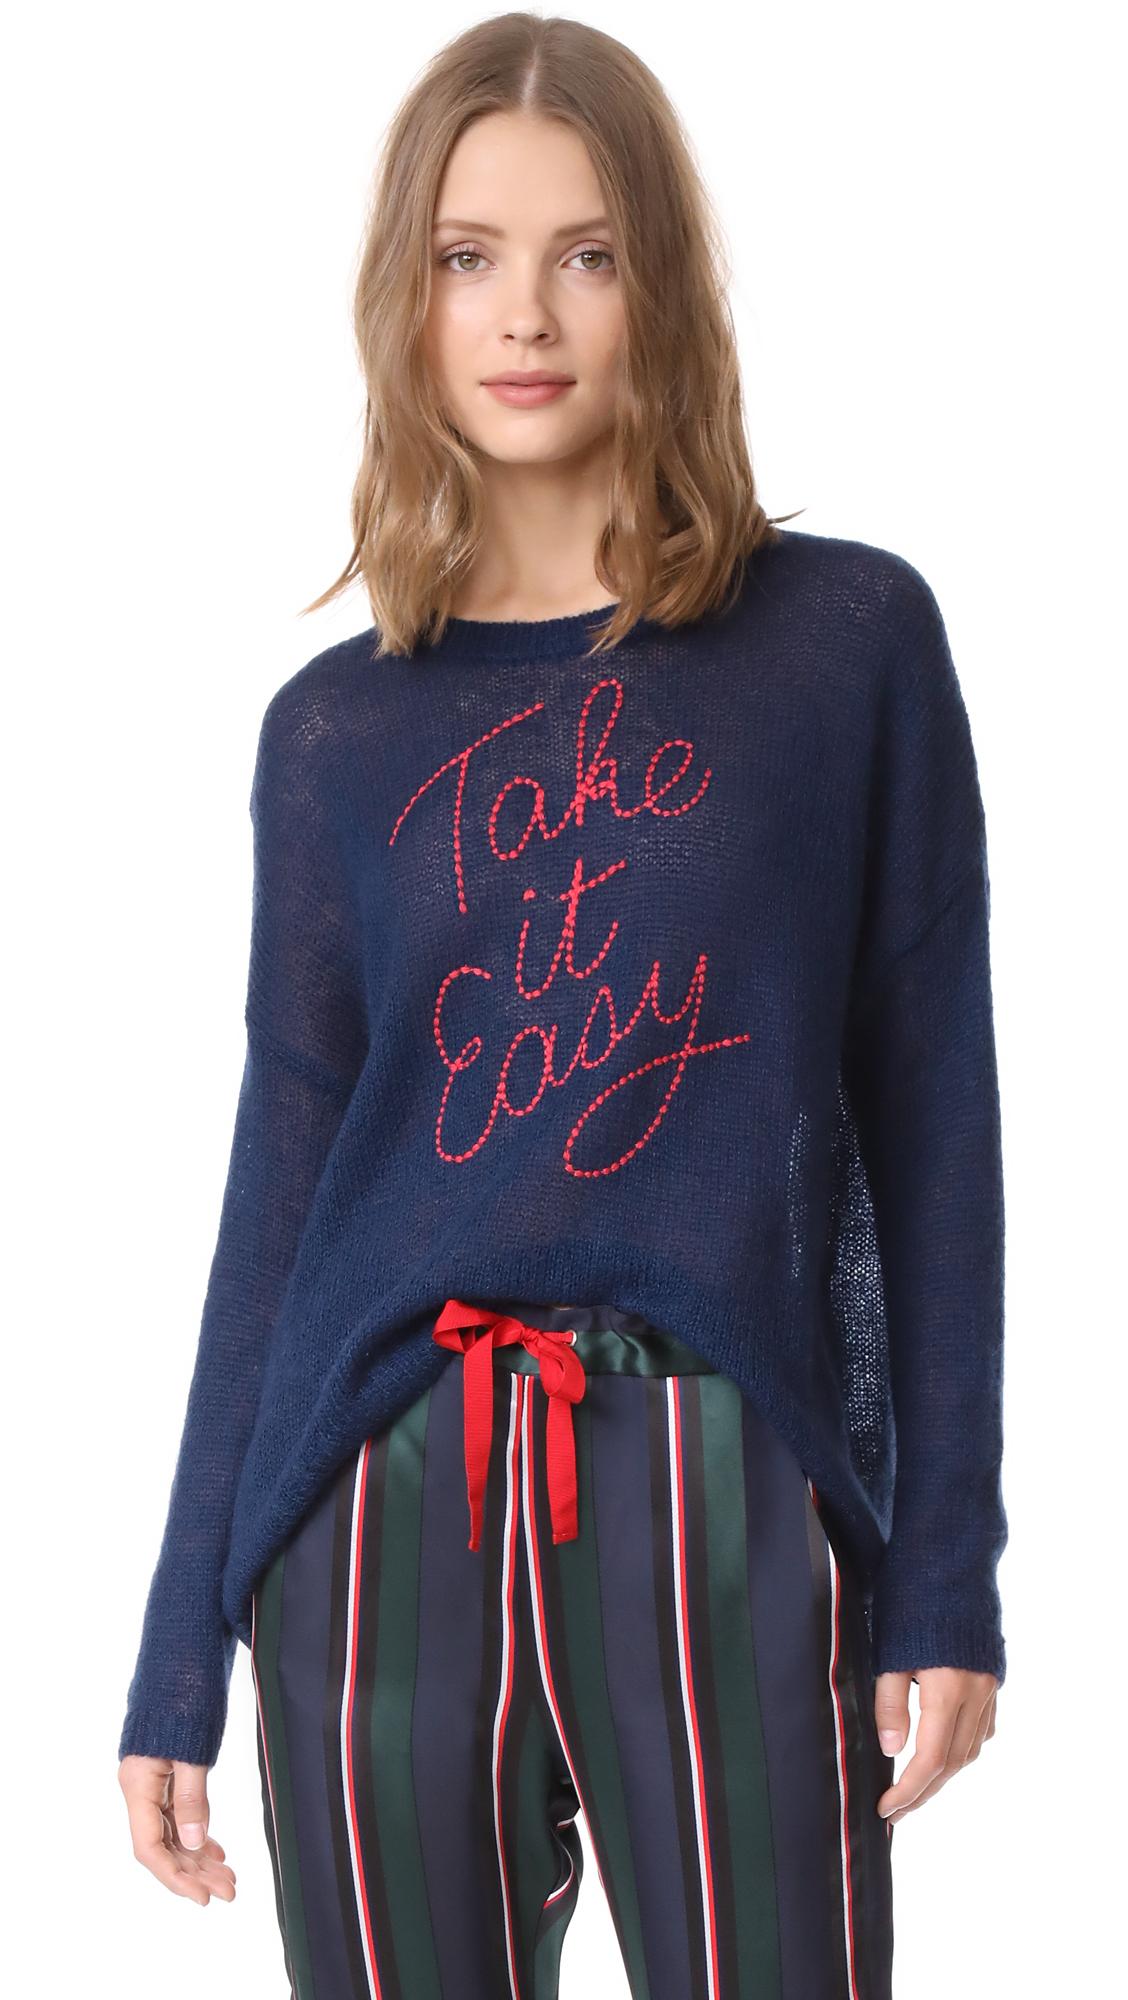 SUNDRY Take It Easy Sweater